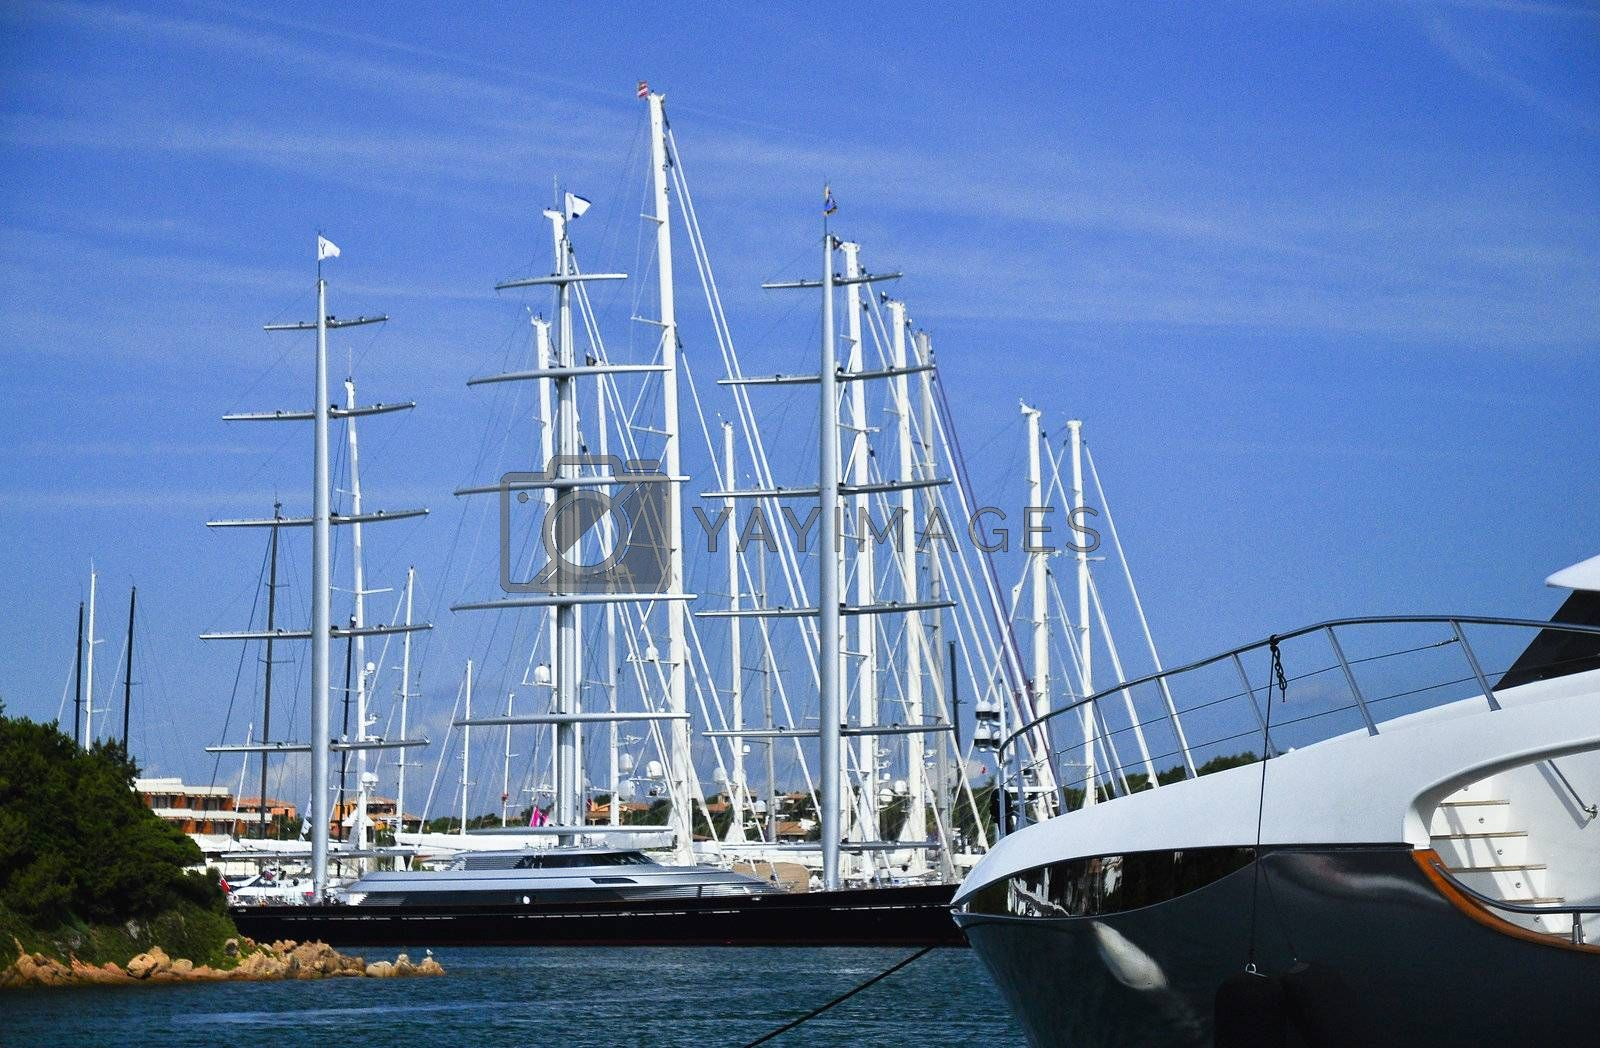 sailboats and yachts at Porto Cervo in Sardinia